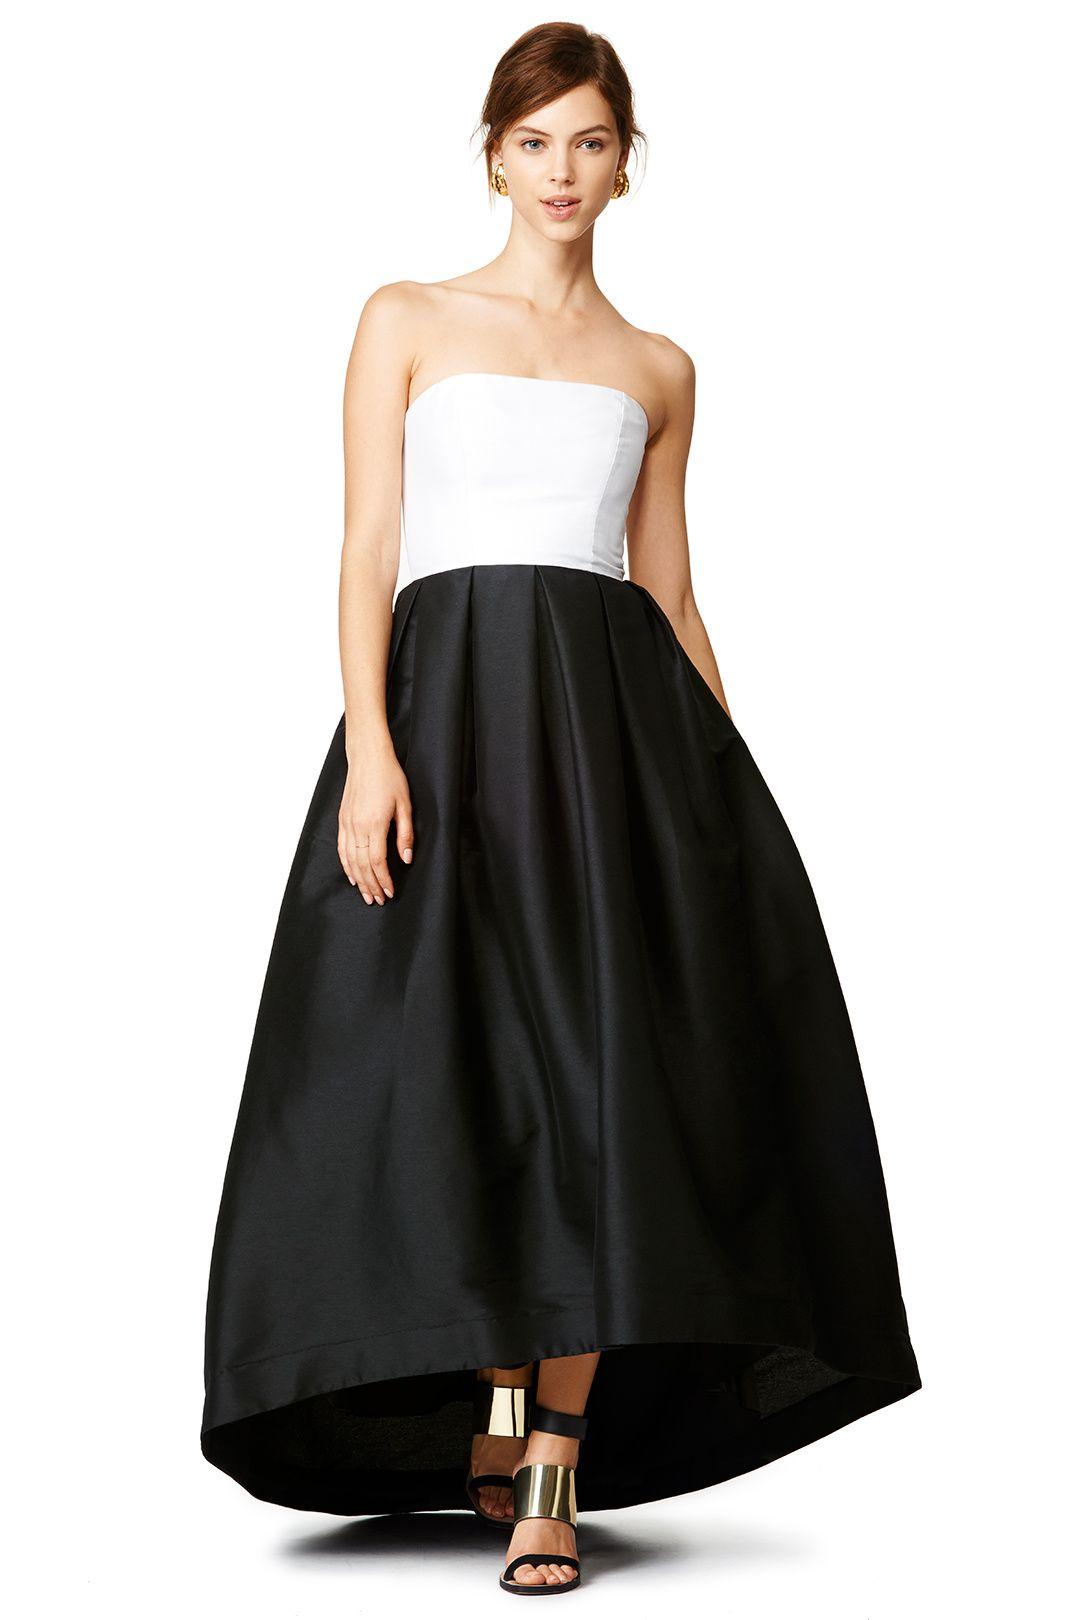 straight fit skirt - Black Monique Lhuillier Cheap Sale Wholesale Price Cheap Sneakernews Online Store Wiki 04ixXWmWzE